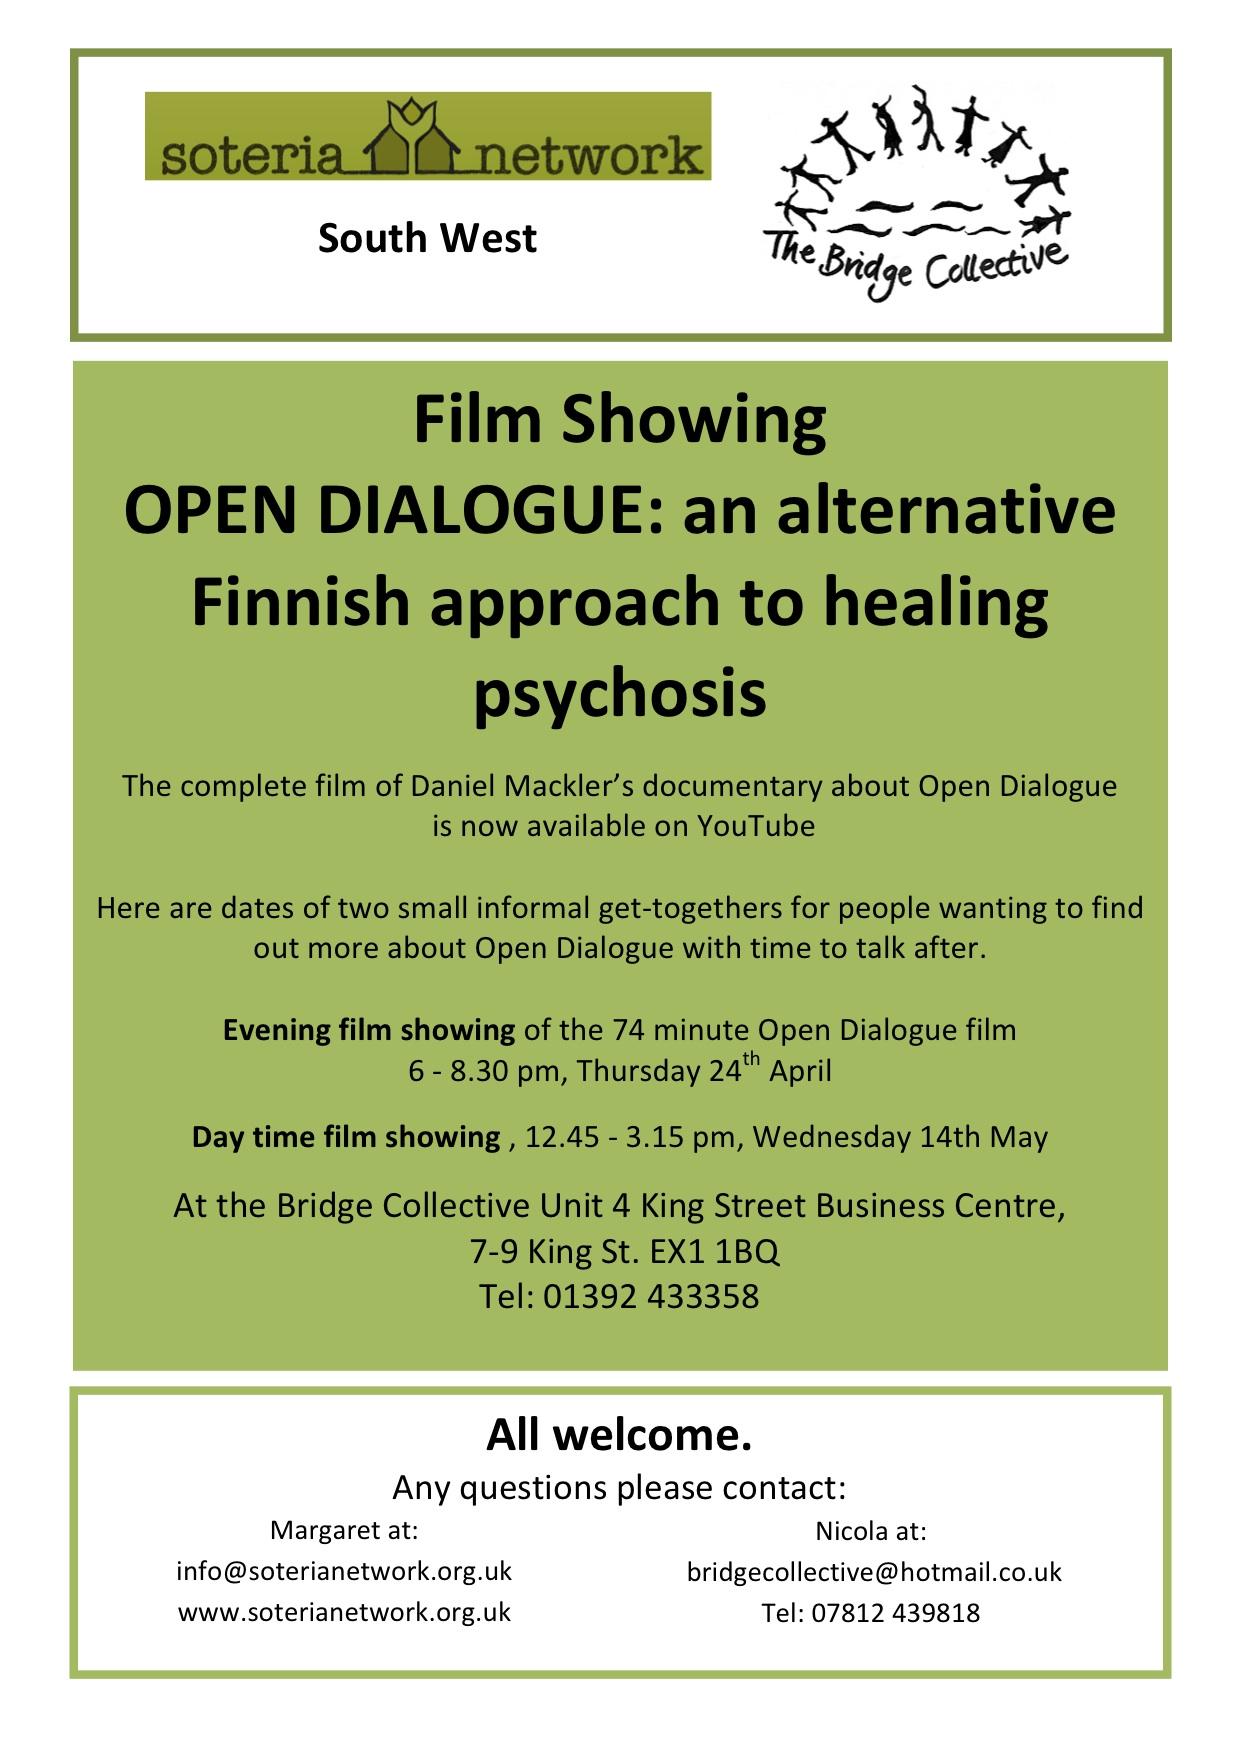 https://www.bridgecollective.org.uk/wp-content/uploads/2014/03/Film-Showing-Open-dialogue-poster-colour.jpg